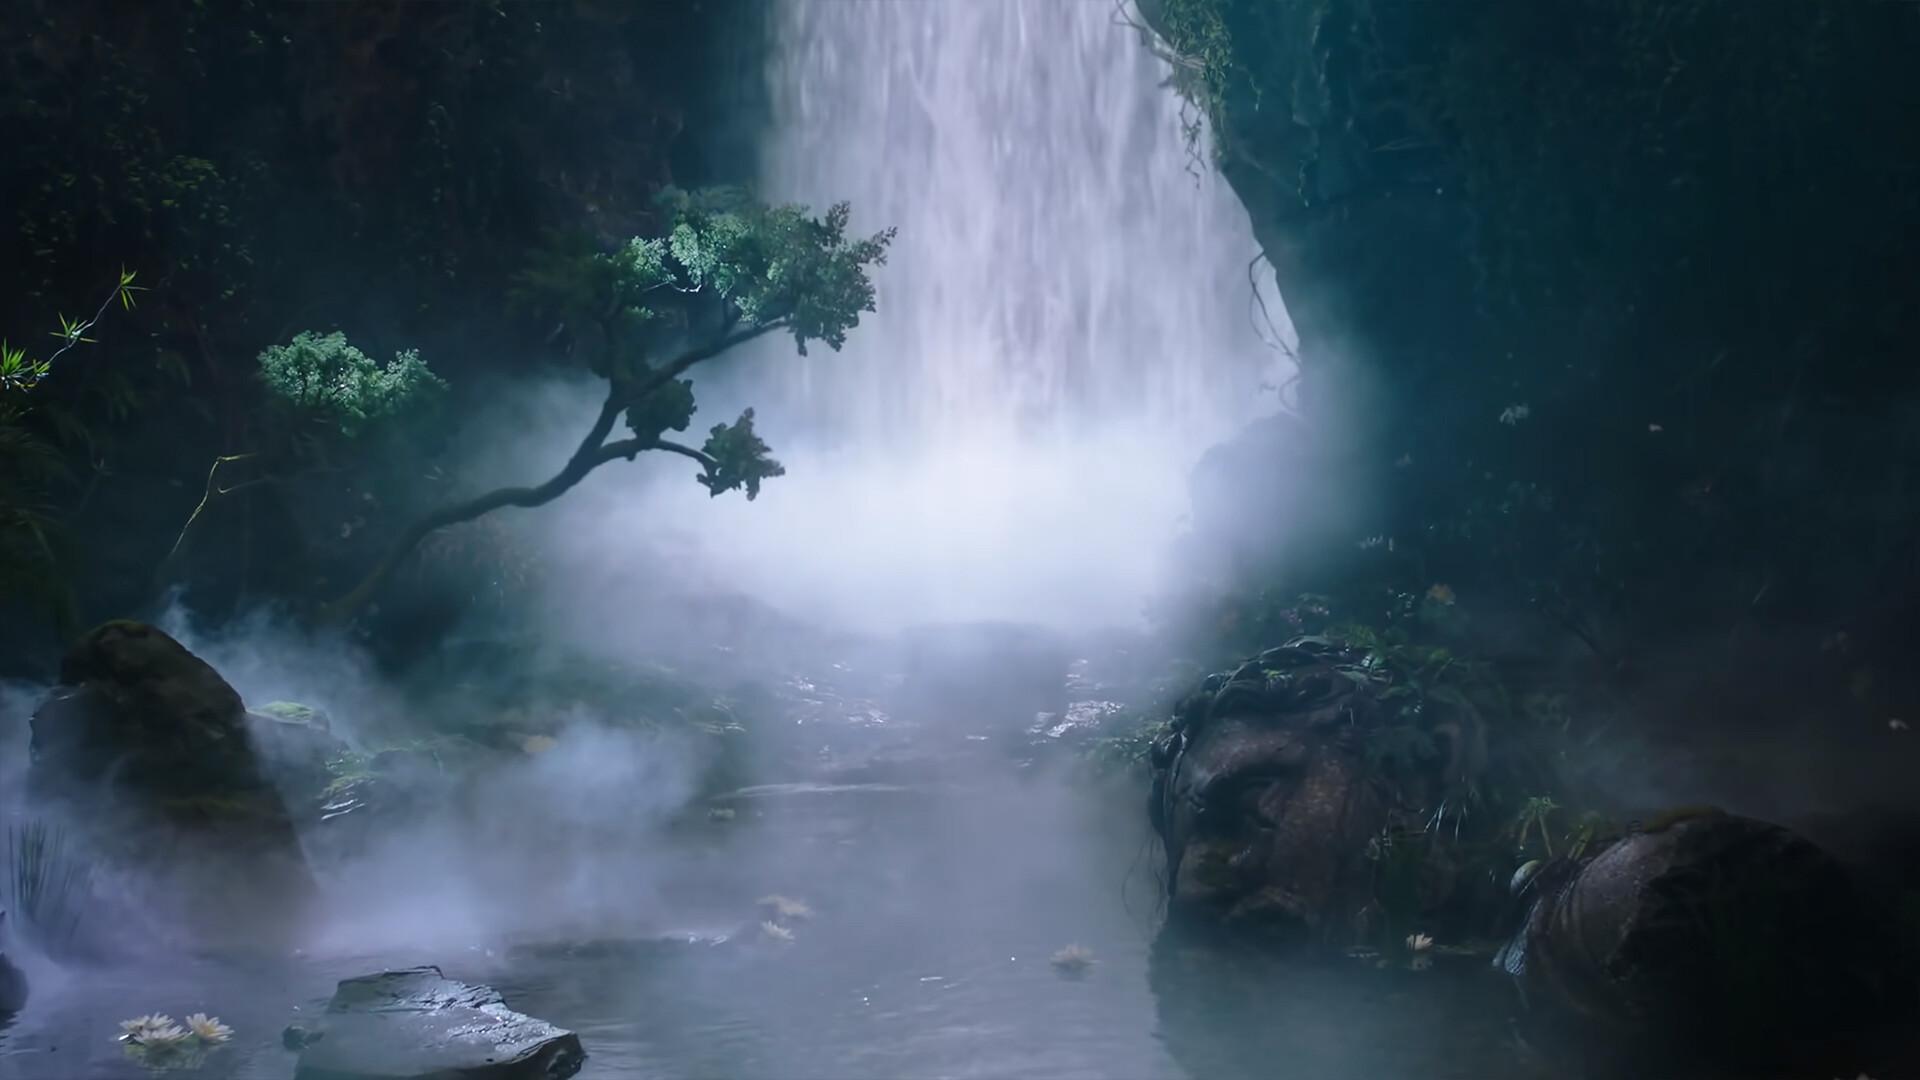 Najim filali saksak aquaman what could be greater than a king scene hd 1 18 screenshot3